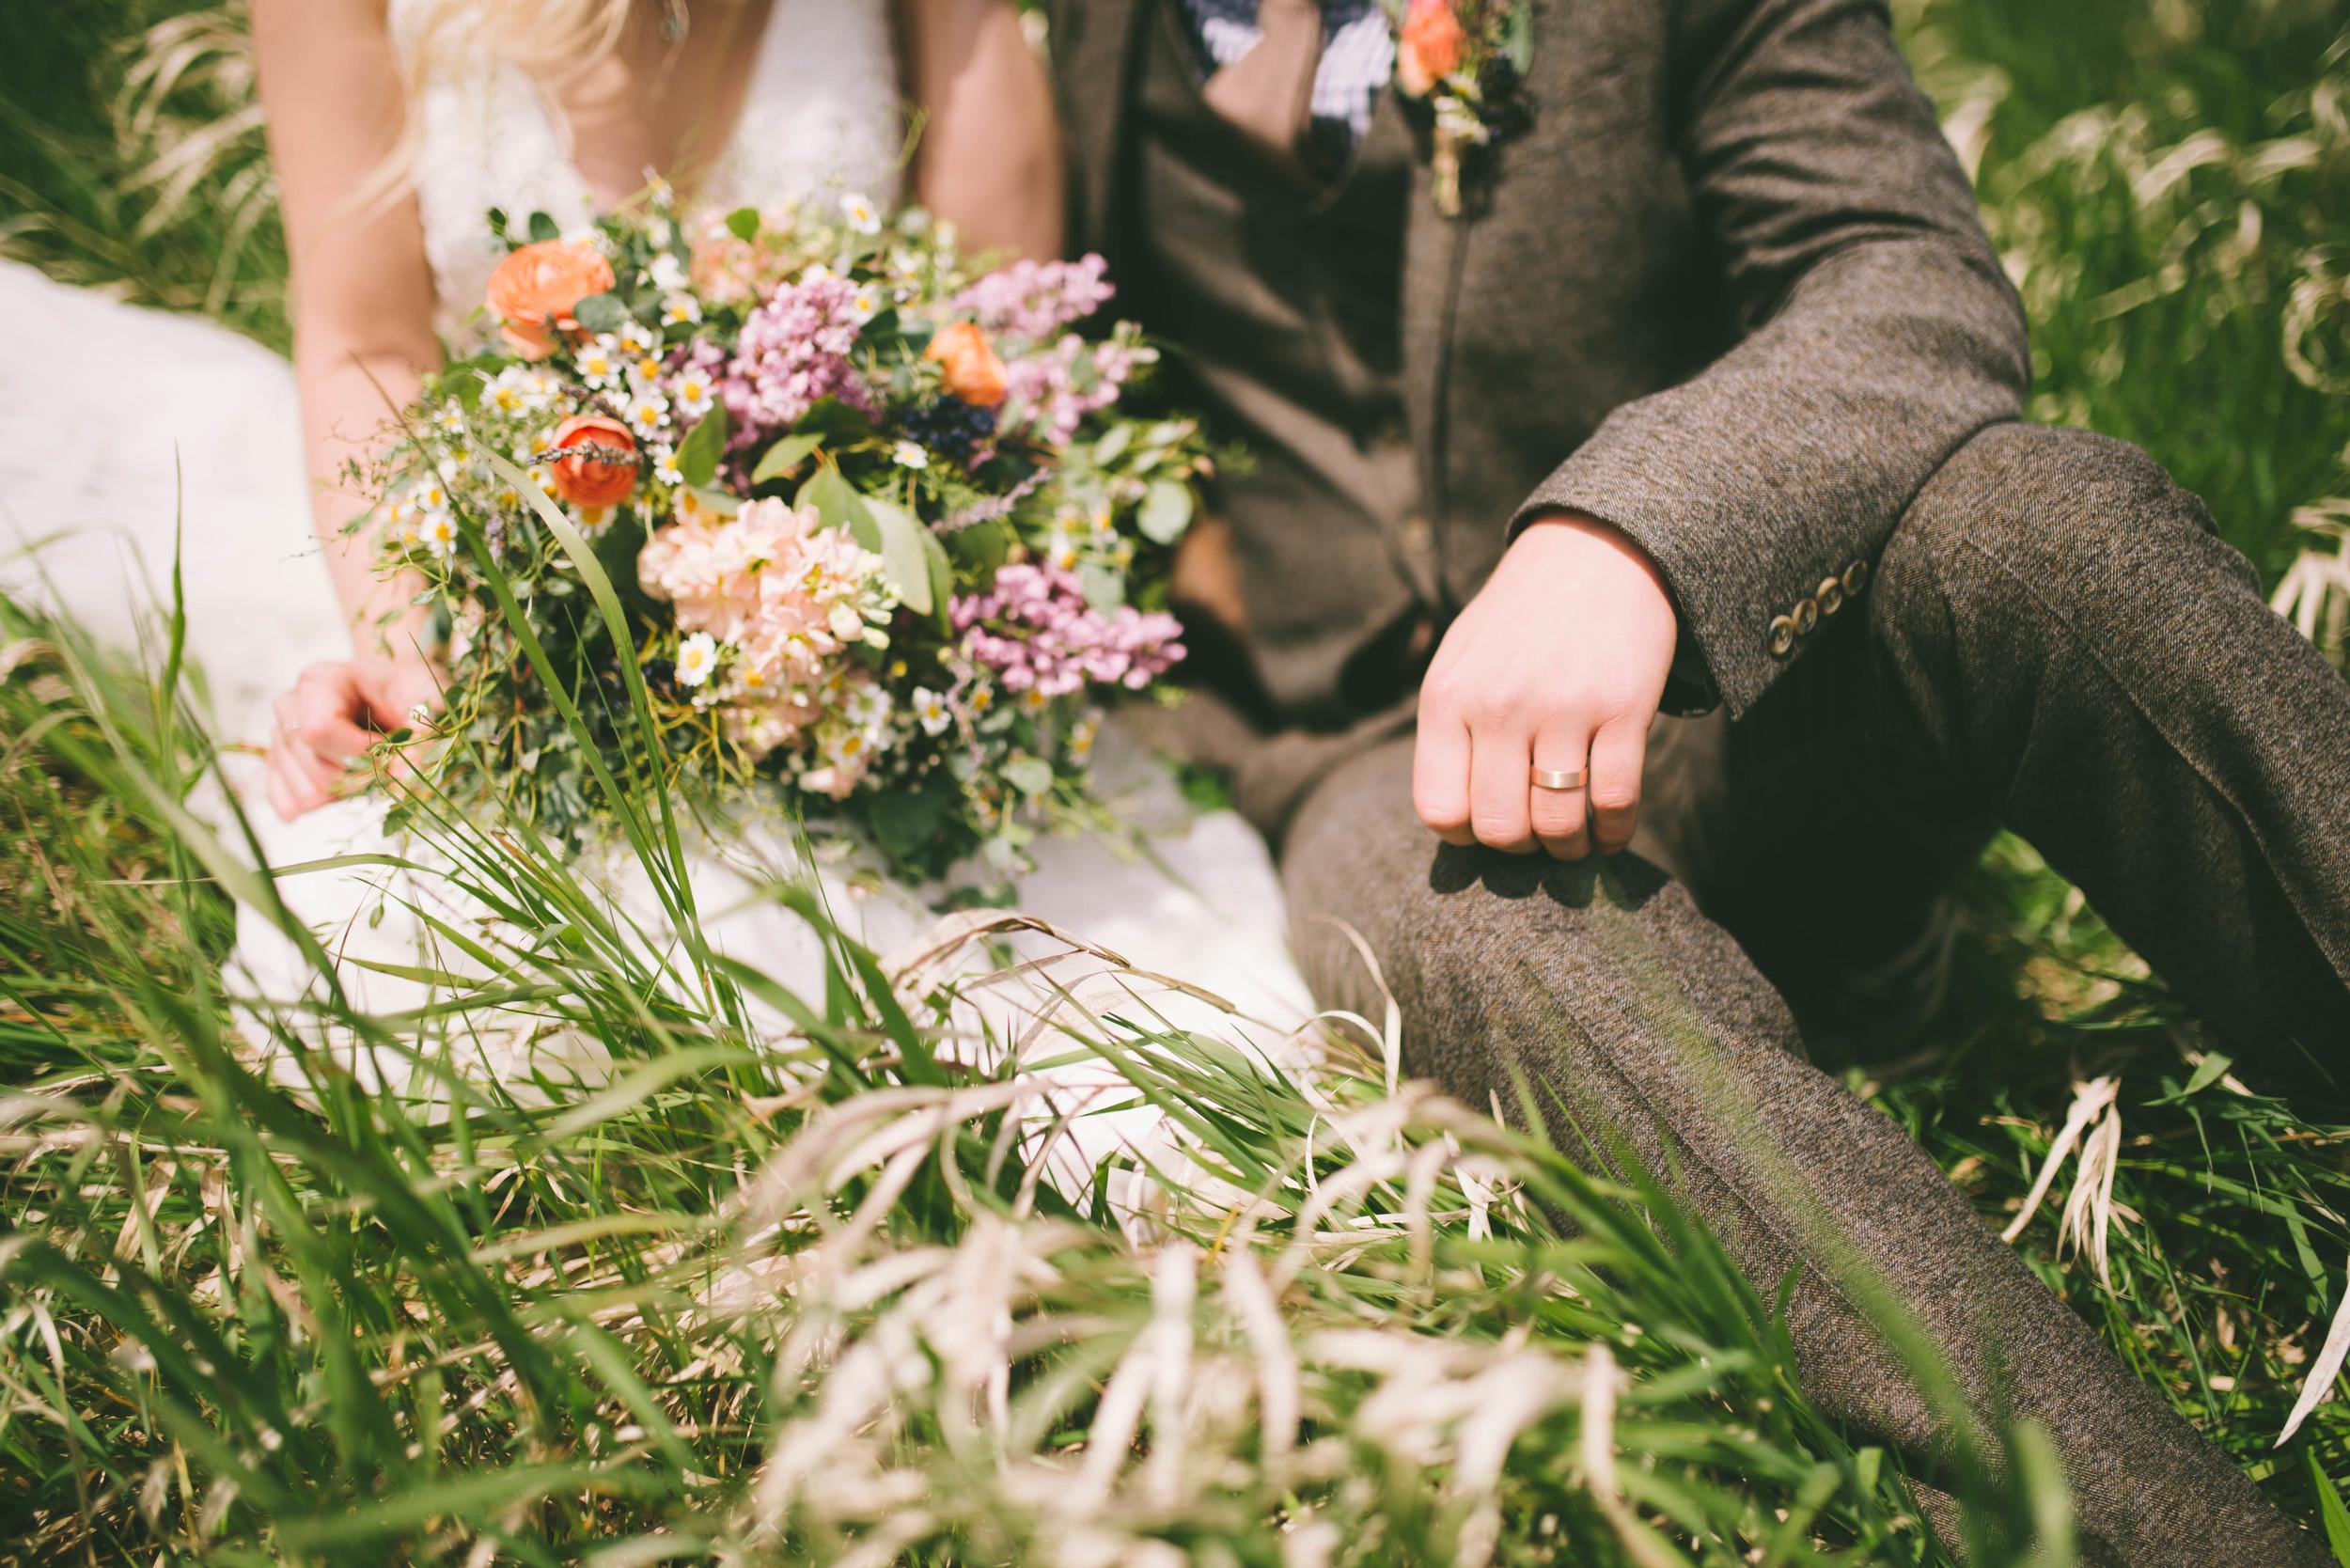 the-bees-knees-floral-design-studio-brainerd-mn-minnesota-wedding-florist-bride-sharayah-wildflower-wedding-bouquet-marion-photography